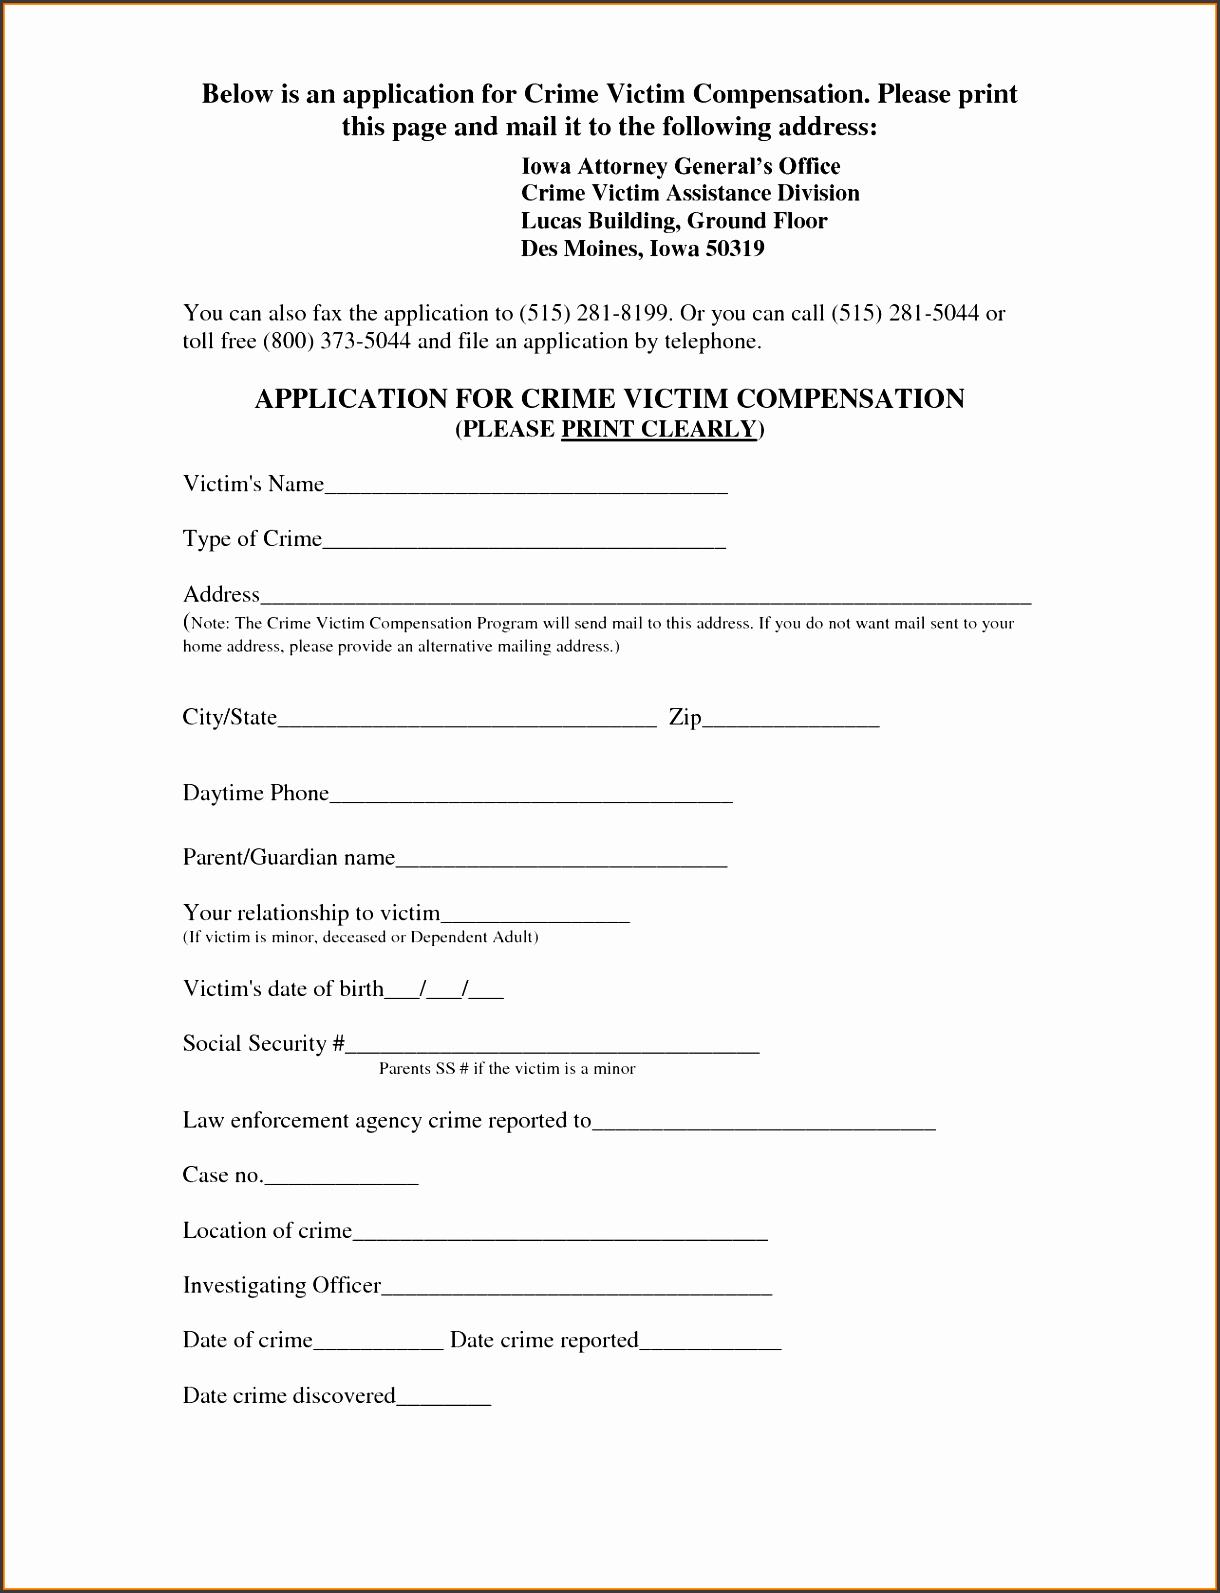 0d585d7f3dd5fbd1f93f70f52a07871d - Crime Victim Assistance Application Form